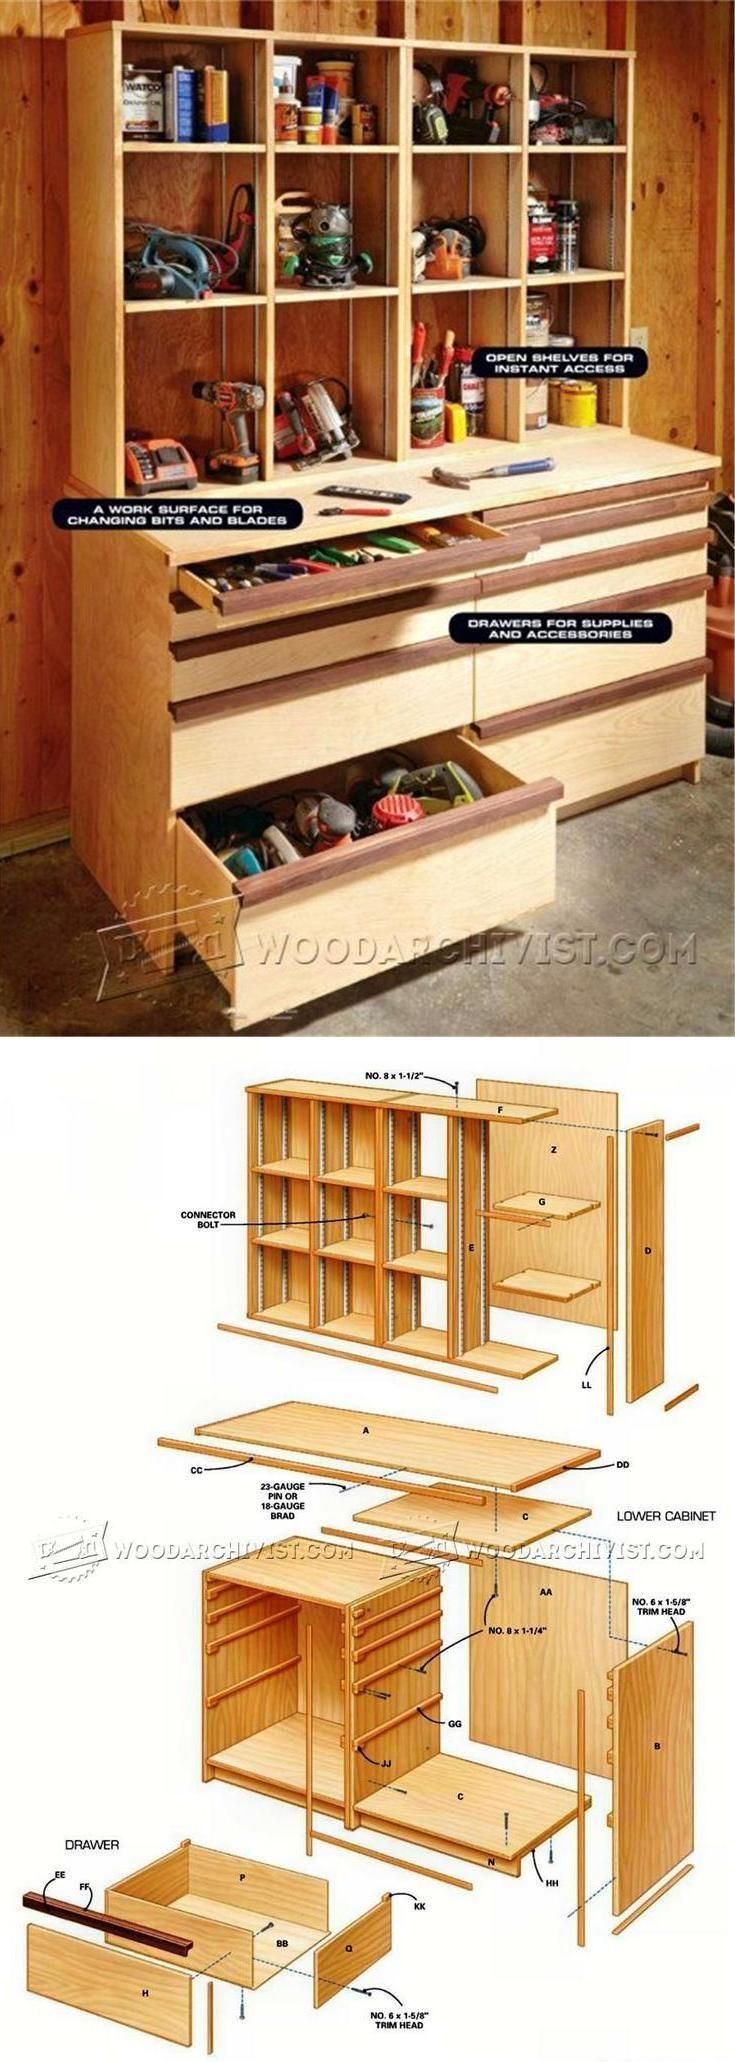 Ultimate Tool Cabinet Plans - Workshop Solutions Plans, Tips and Tricks | WoodArchivist.com #WoodworkingPlansWorkbench